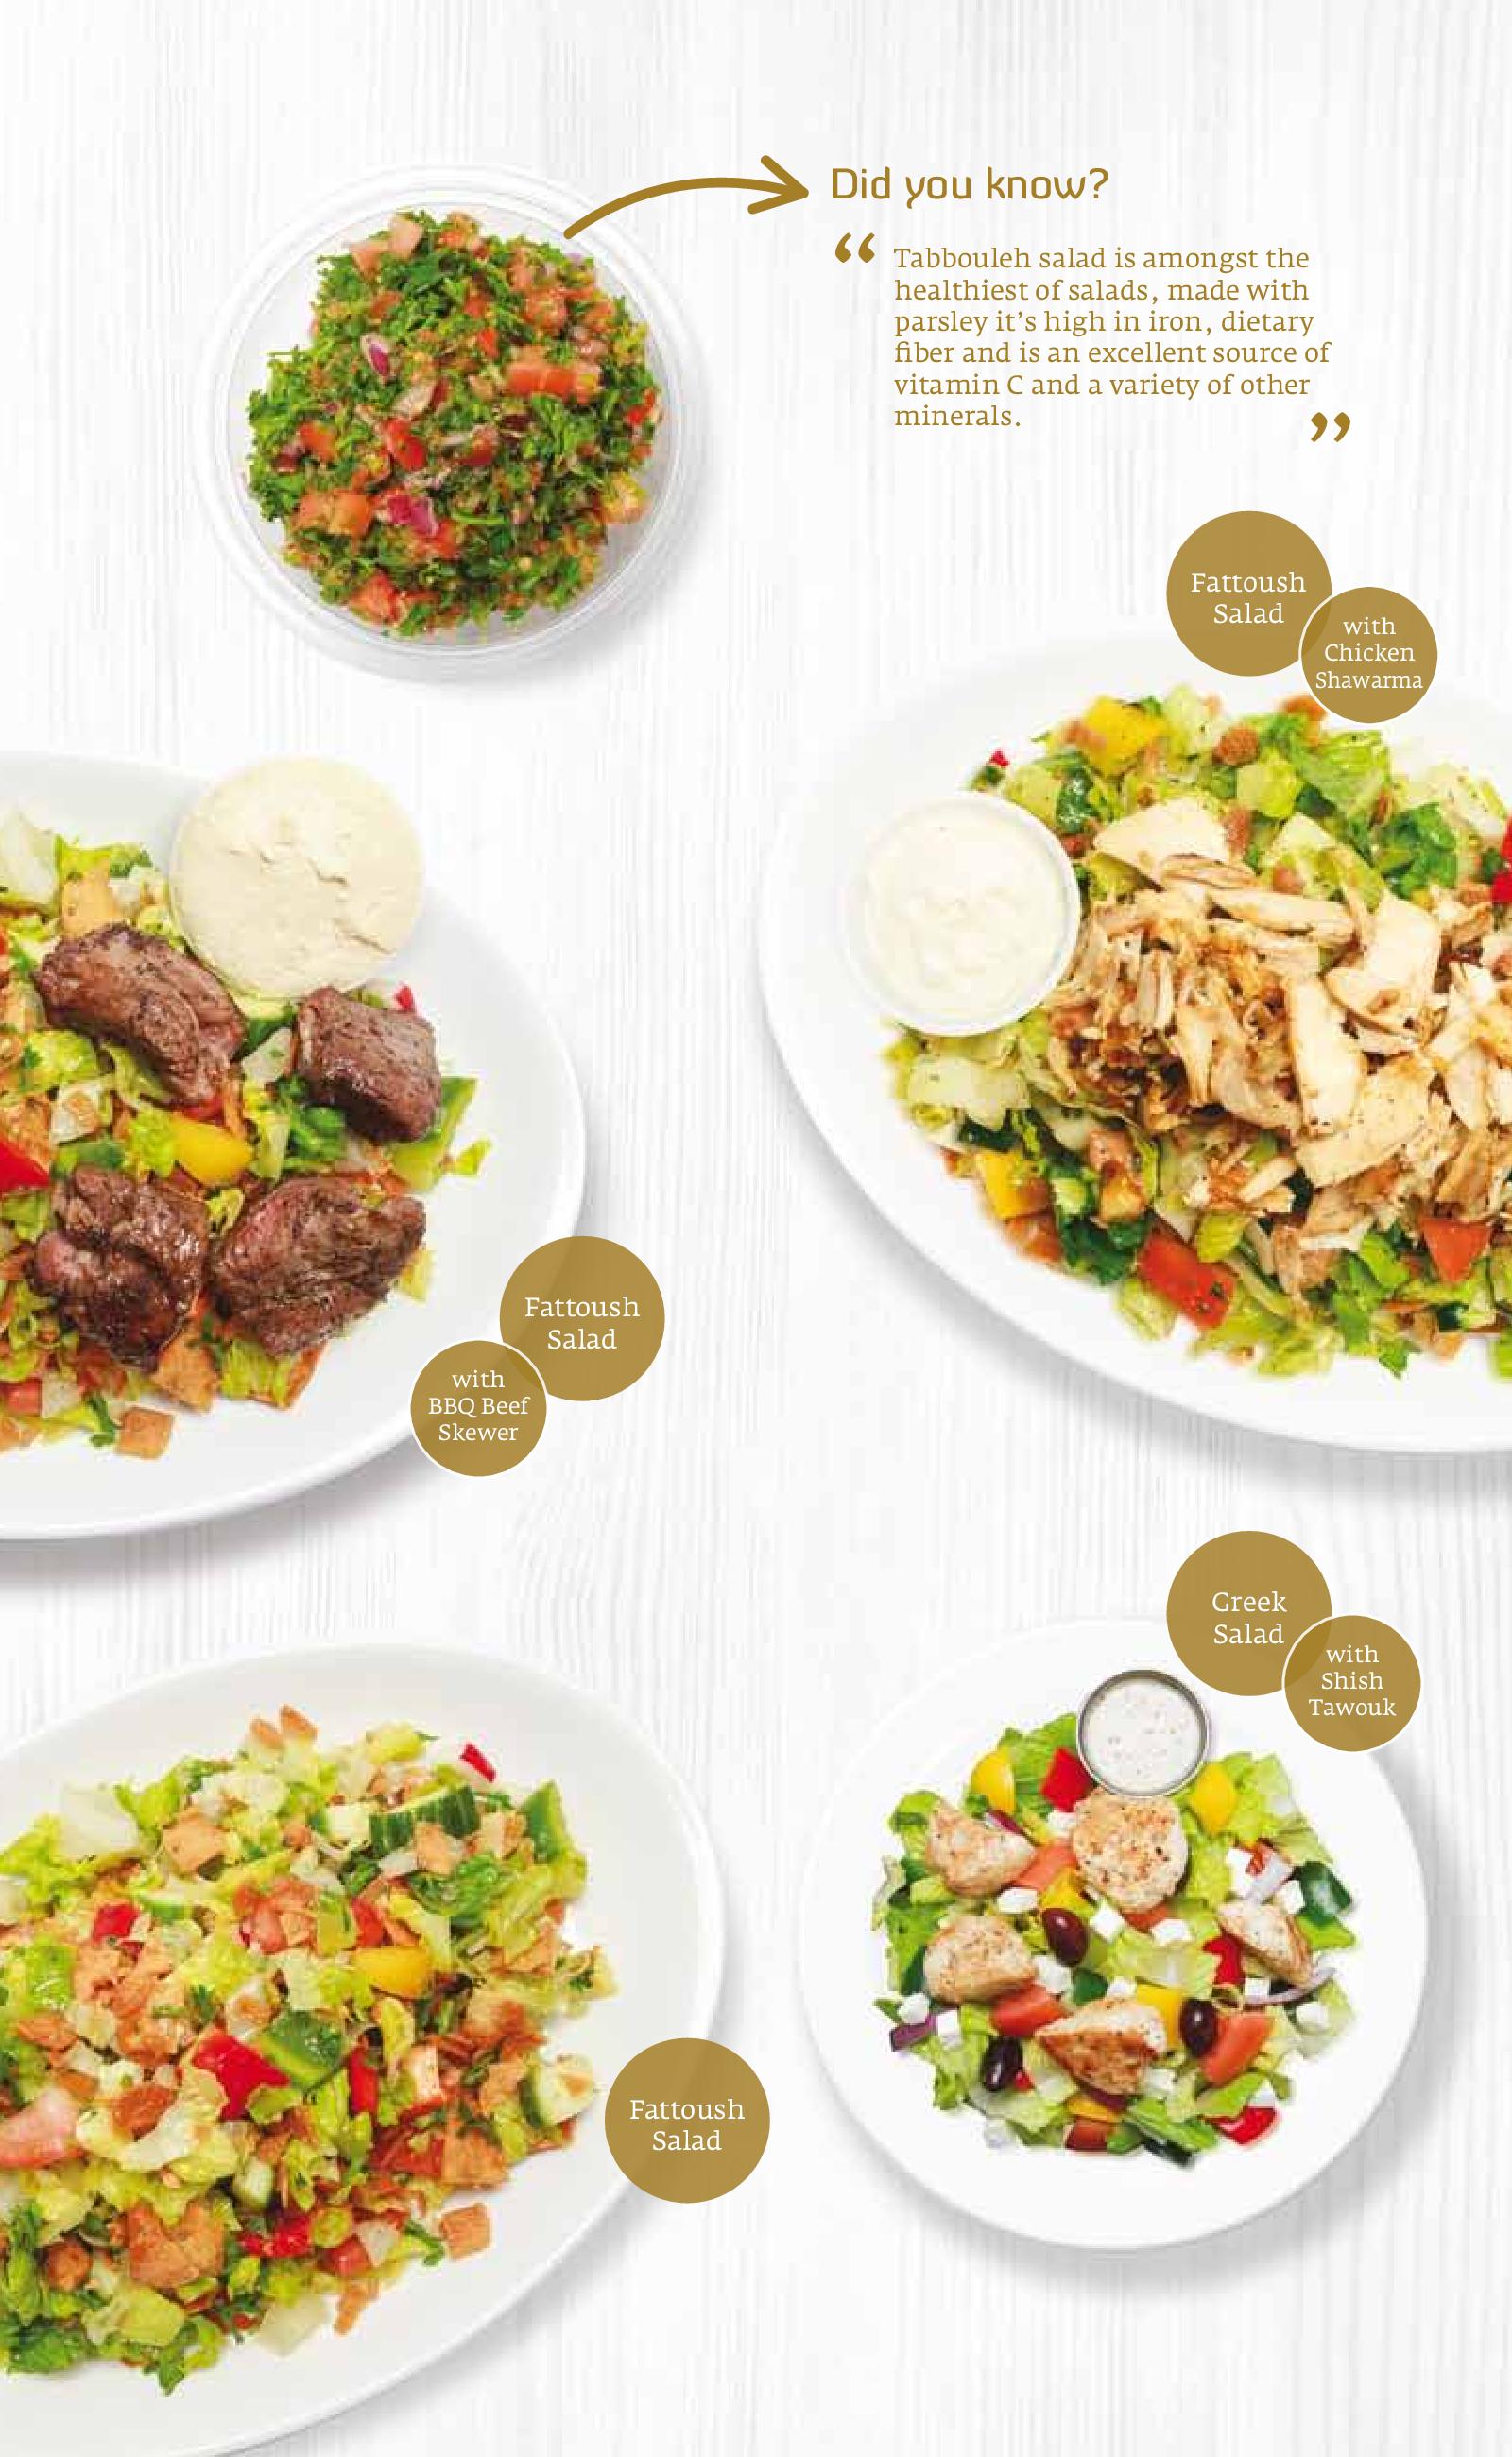 003-insert-menu-salads-f-cs6_pk_2